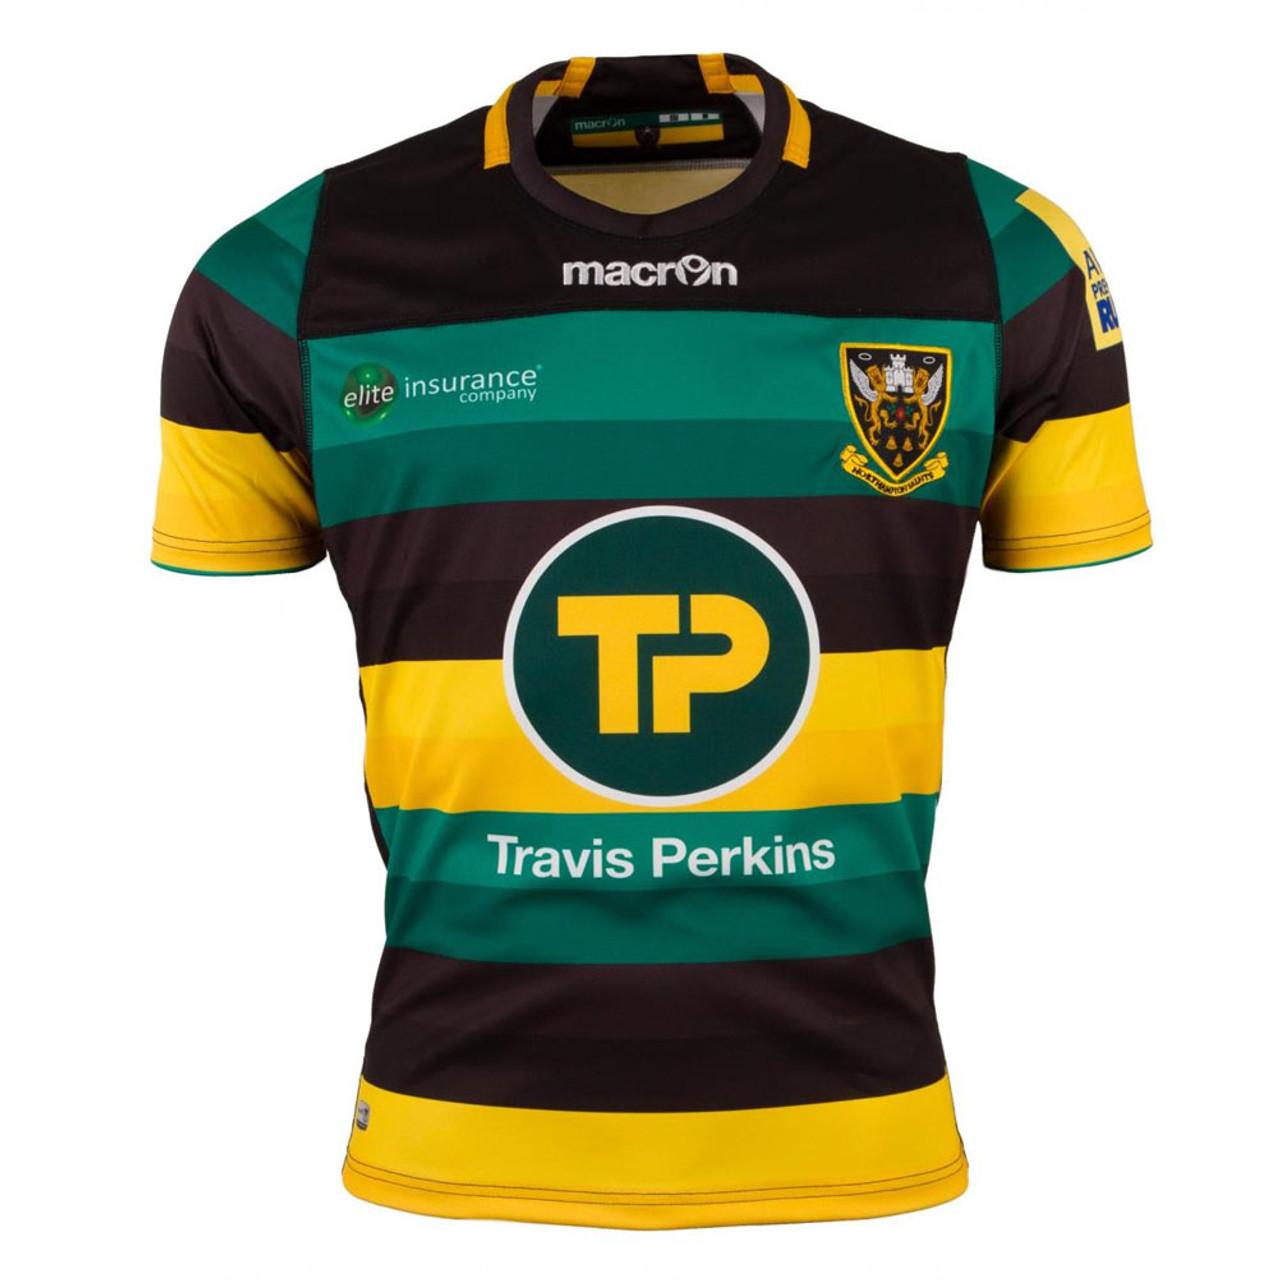 06ad0c035 MACRON northampton saints home match rugby shirt  blk grn